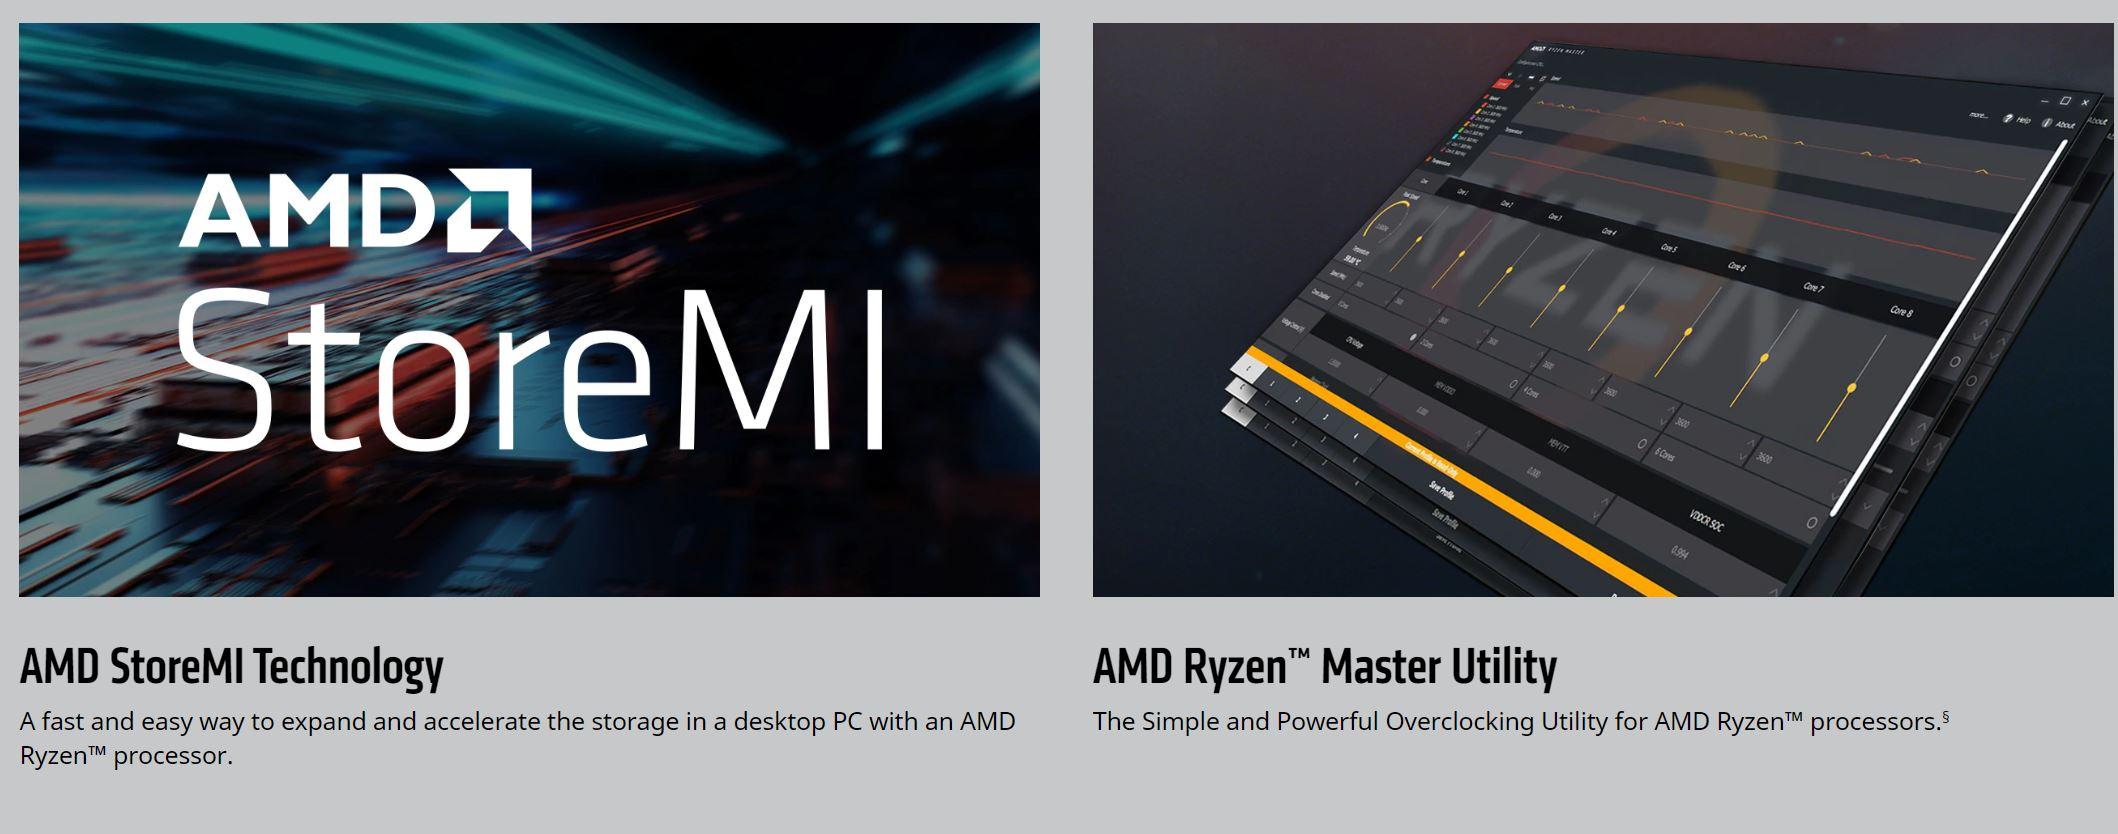 Amd Ryzen 9 3900xt 12 Core Am4 3 8ghz Cpu Processor Umart Com Au